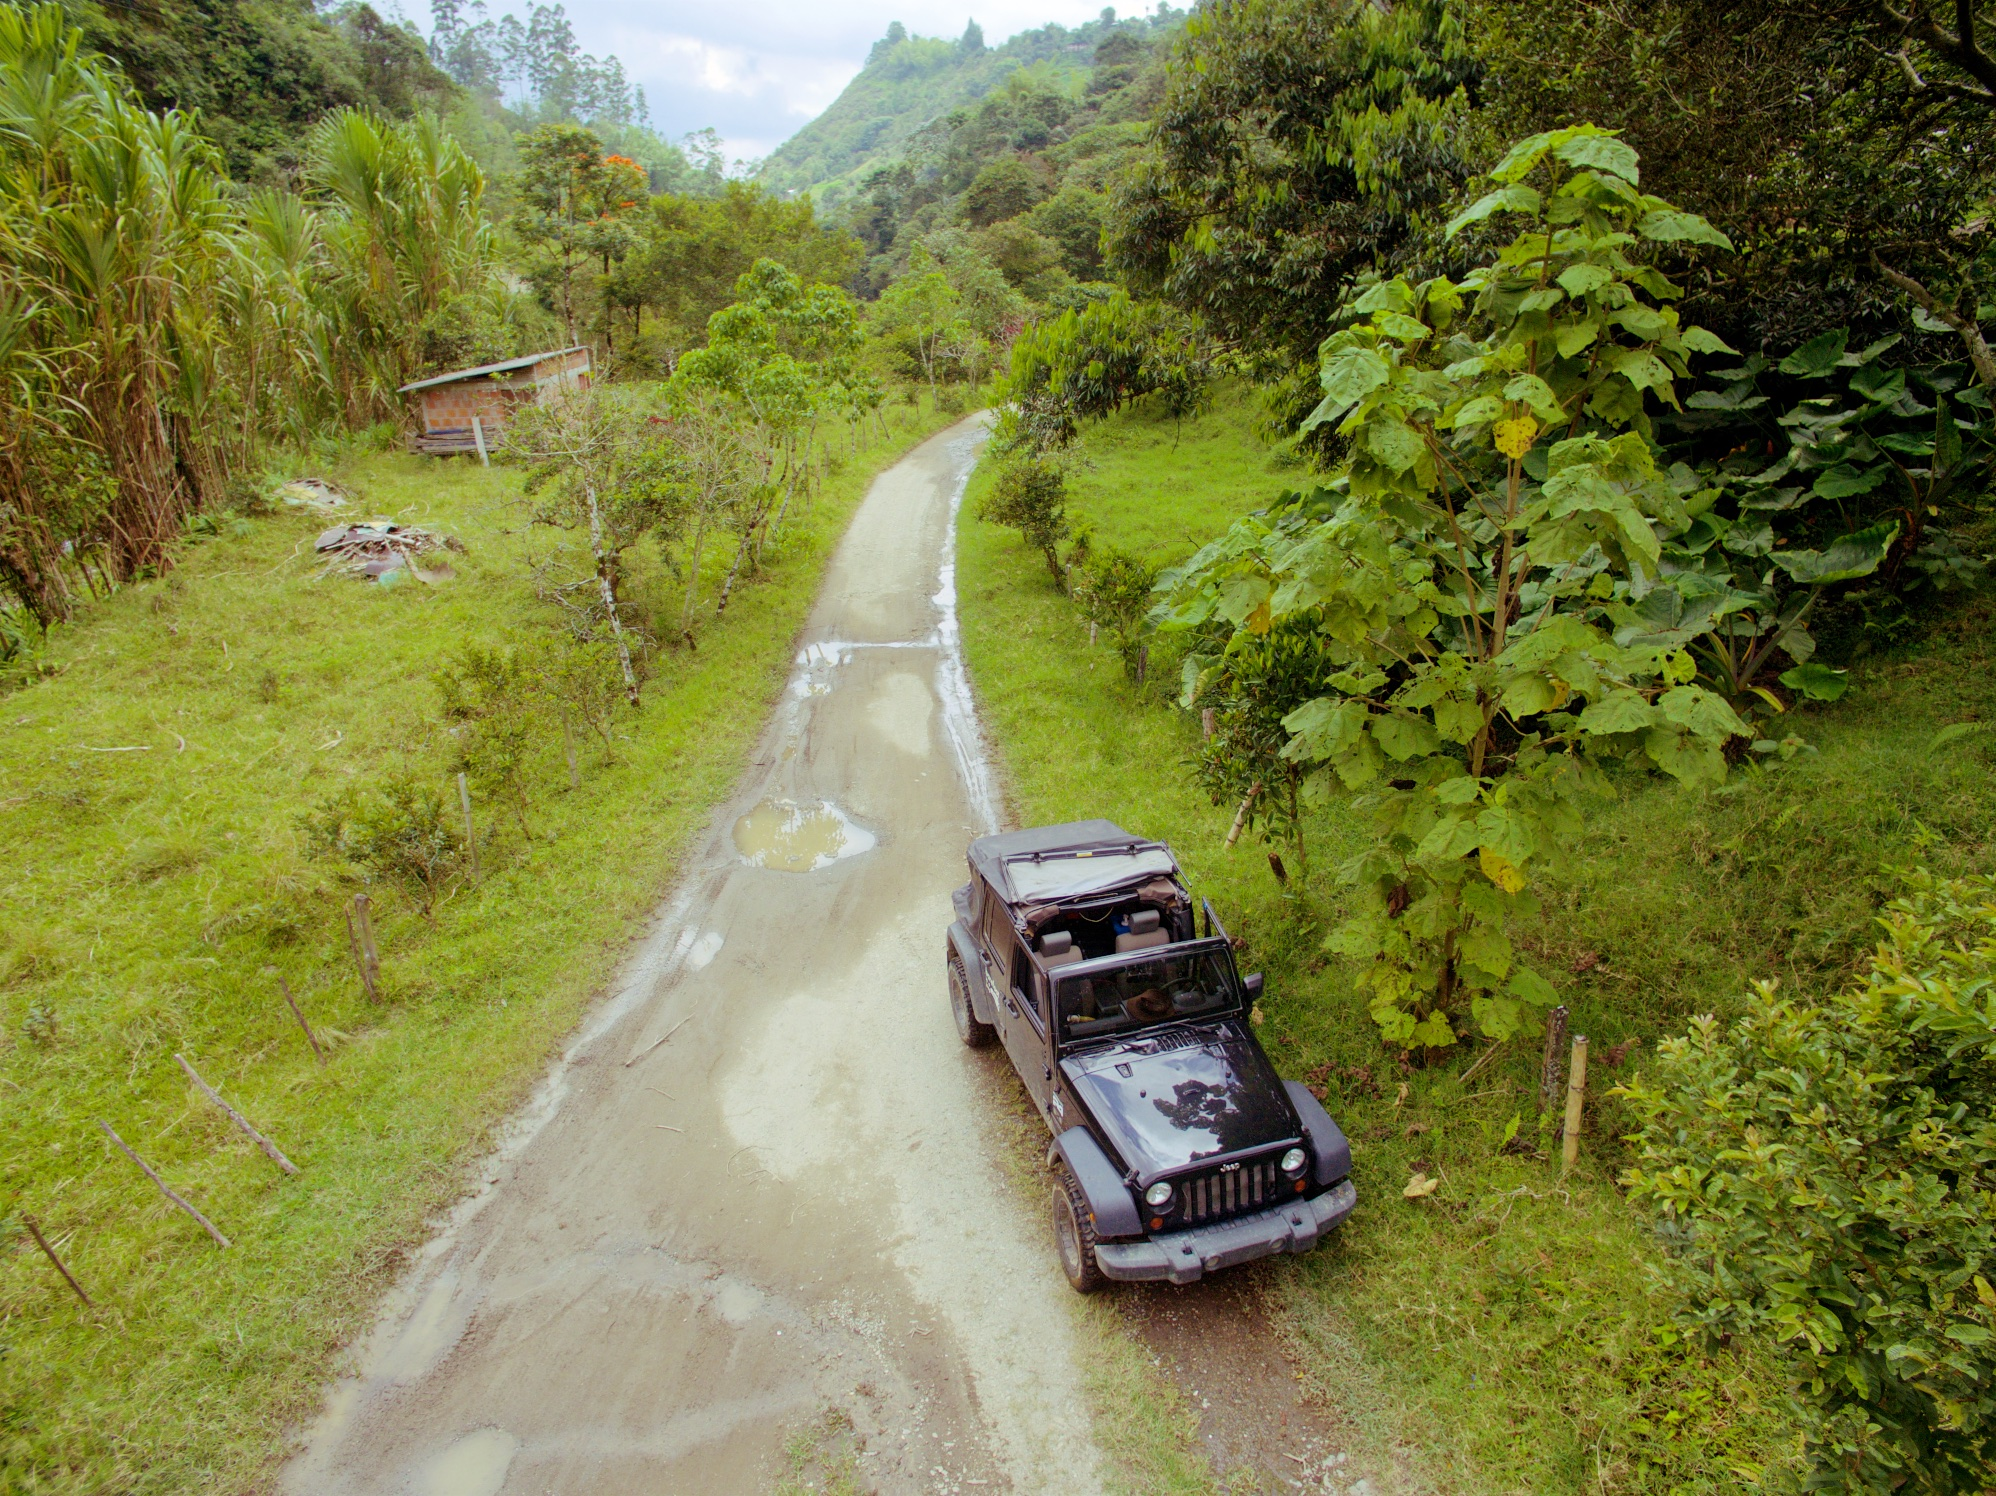 Drone shot of the Jeep near coffee field in Salento, Colombia.